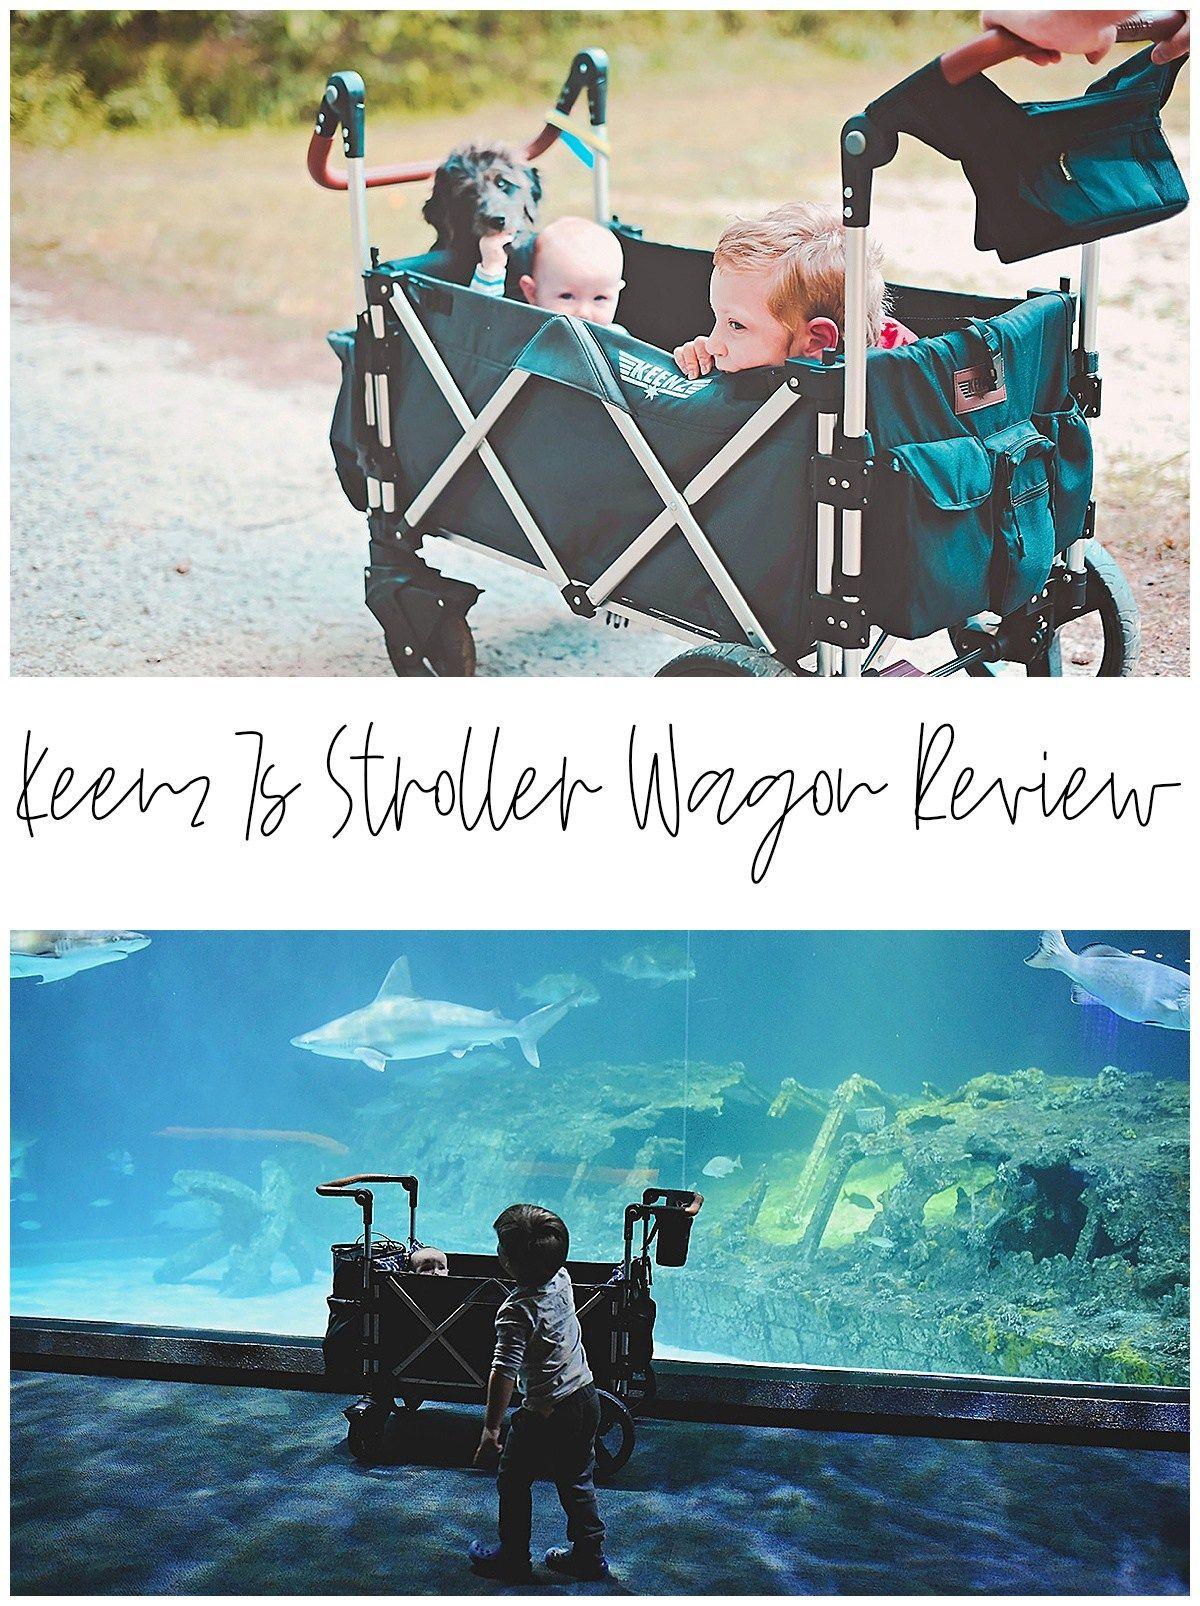 Keenz 7s Stroller Wagon Review Playpen, Purple fabric